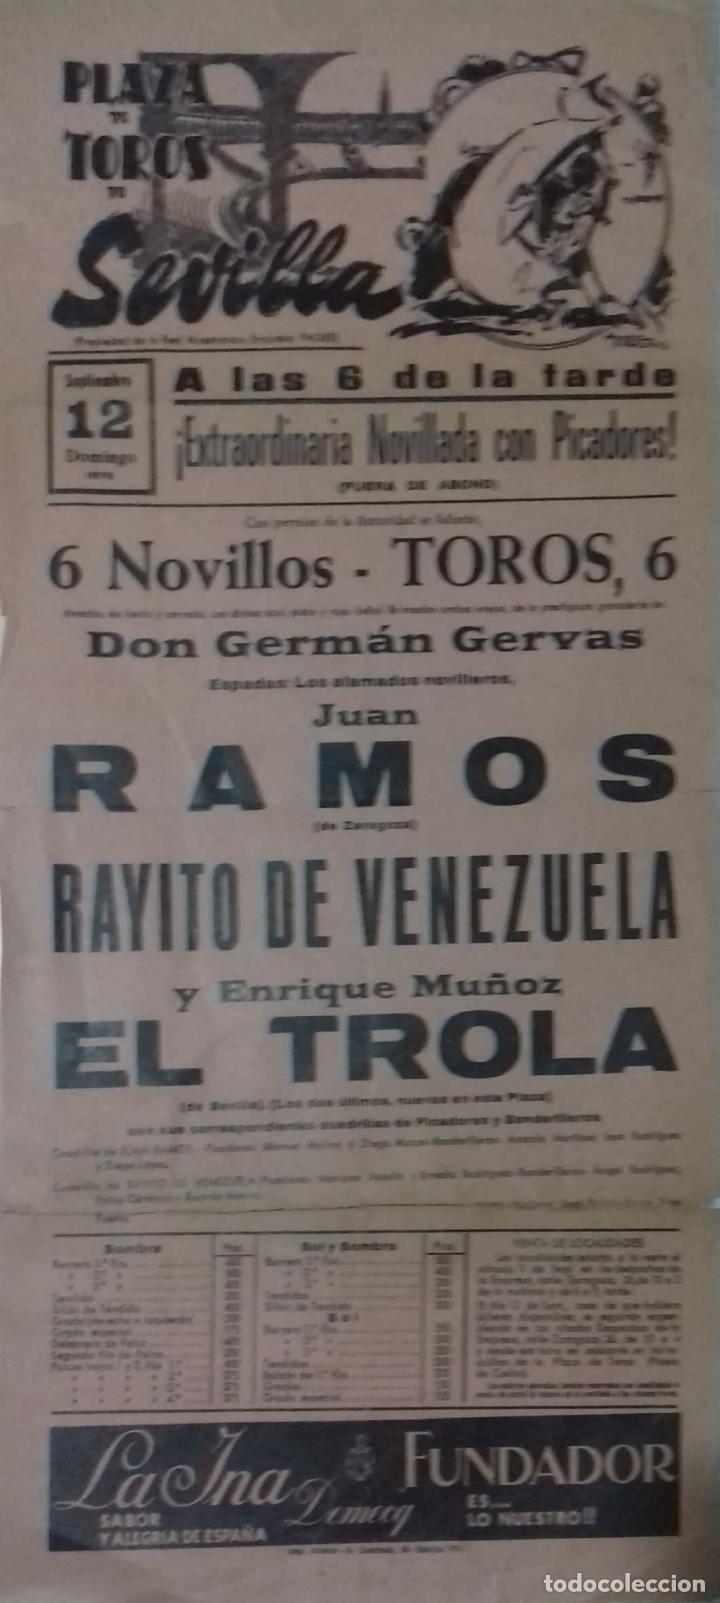 CARTEL. PLAZA TOROS DE SEVILLA. 1976. LEER. (Coleccionismo - Carteles Gran Formato - Carteles Toros)